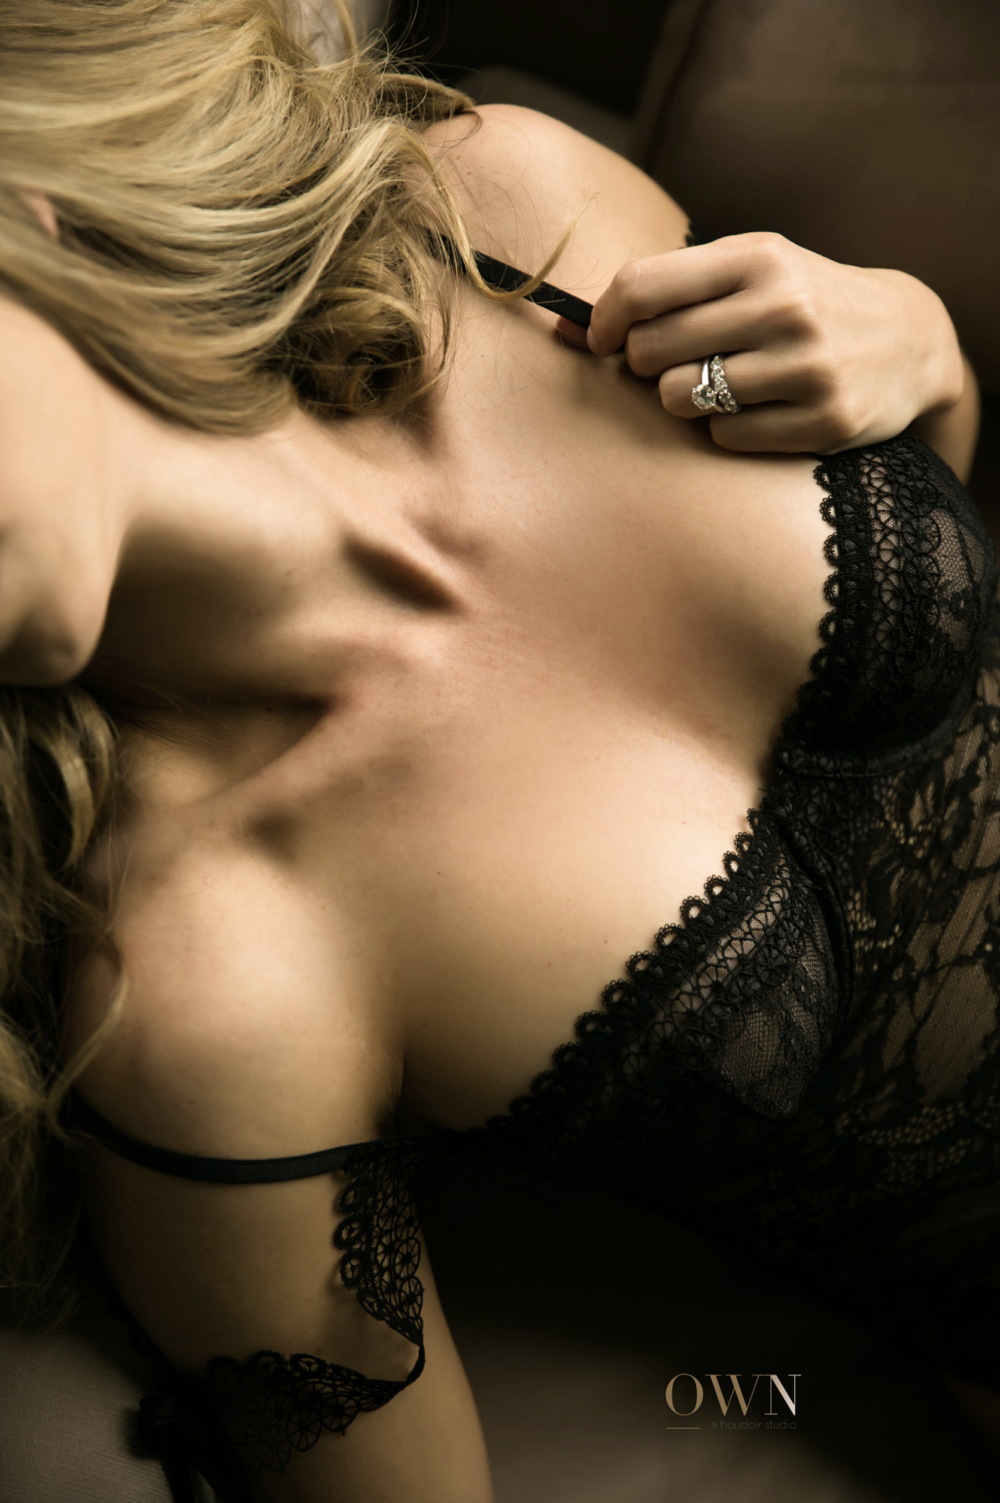 boudoir atlanta, valentines boudoir, atlanta boudoir photographer, boudoir photography atlanta, boudoir gift ideas